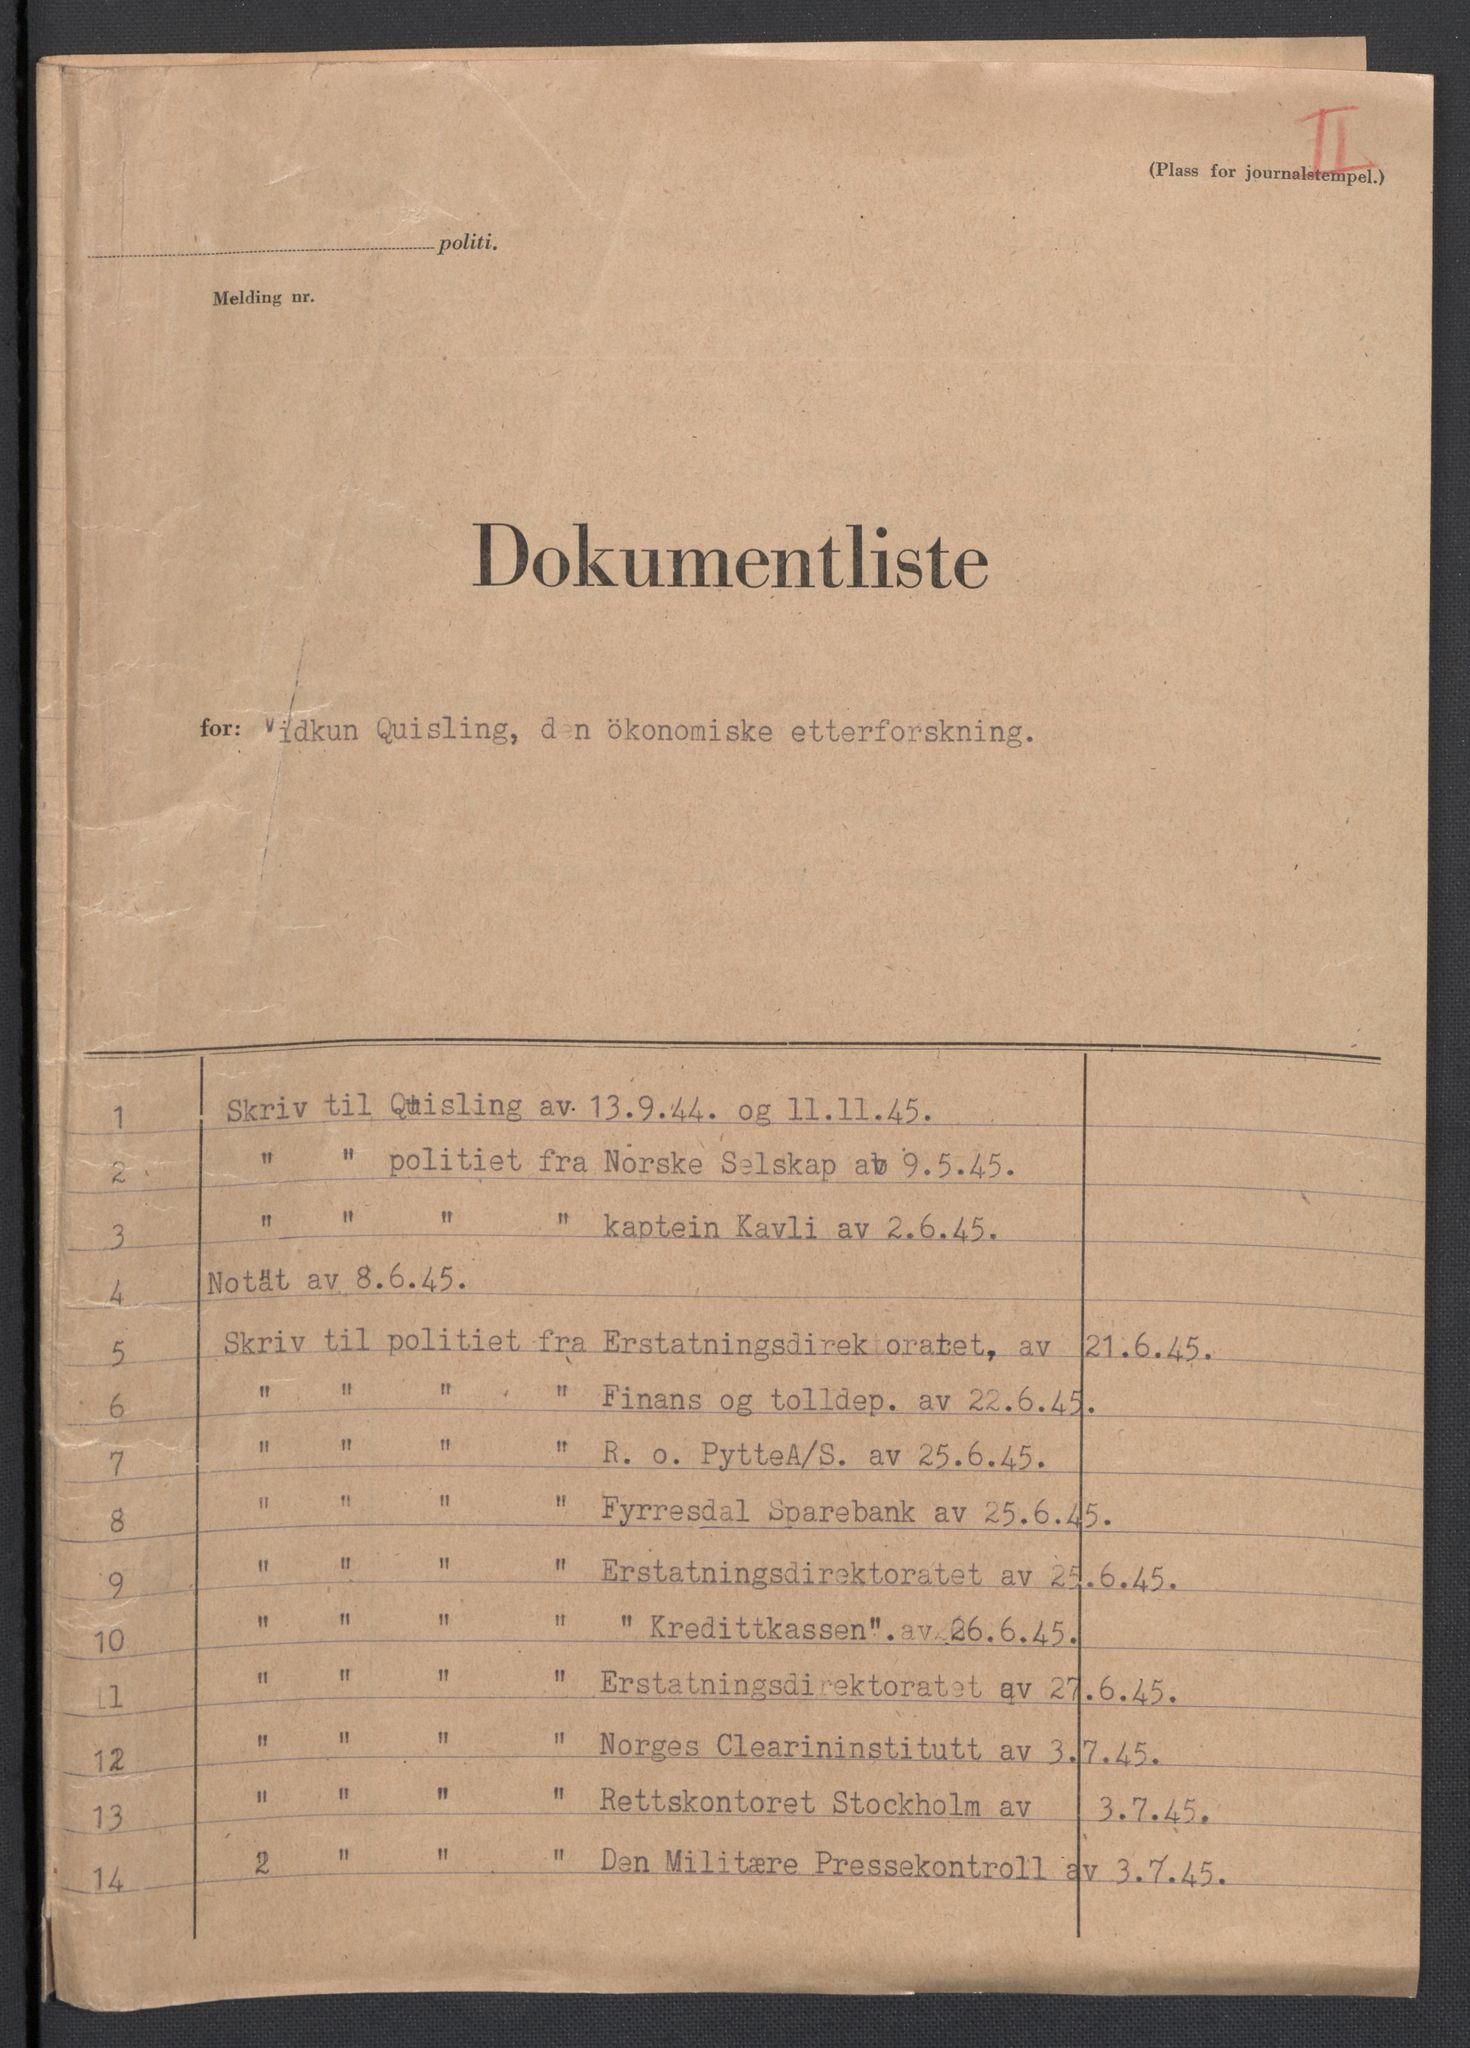 RA, Landssvikarkivet, D/Da/L0006: Dnr. 29, 1945, s. 302